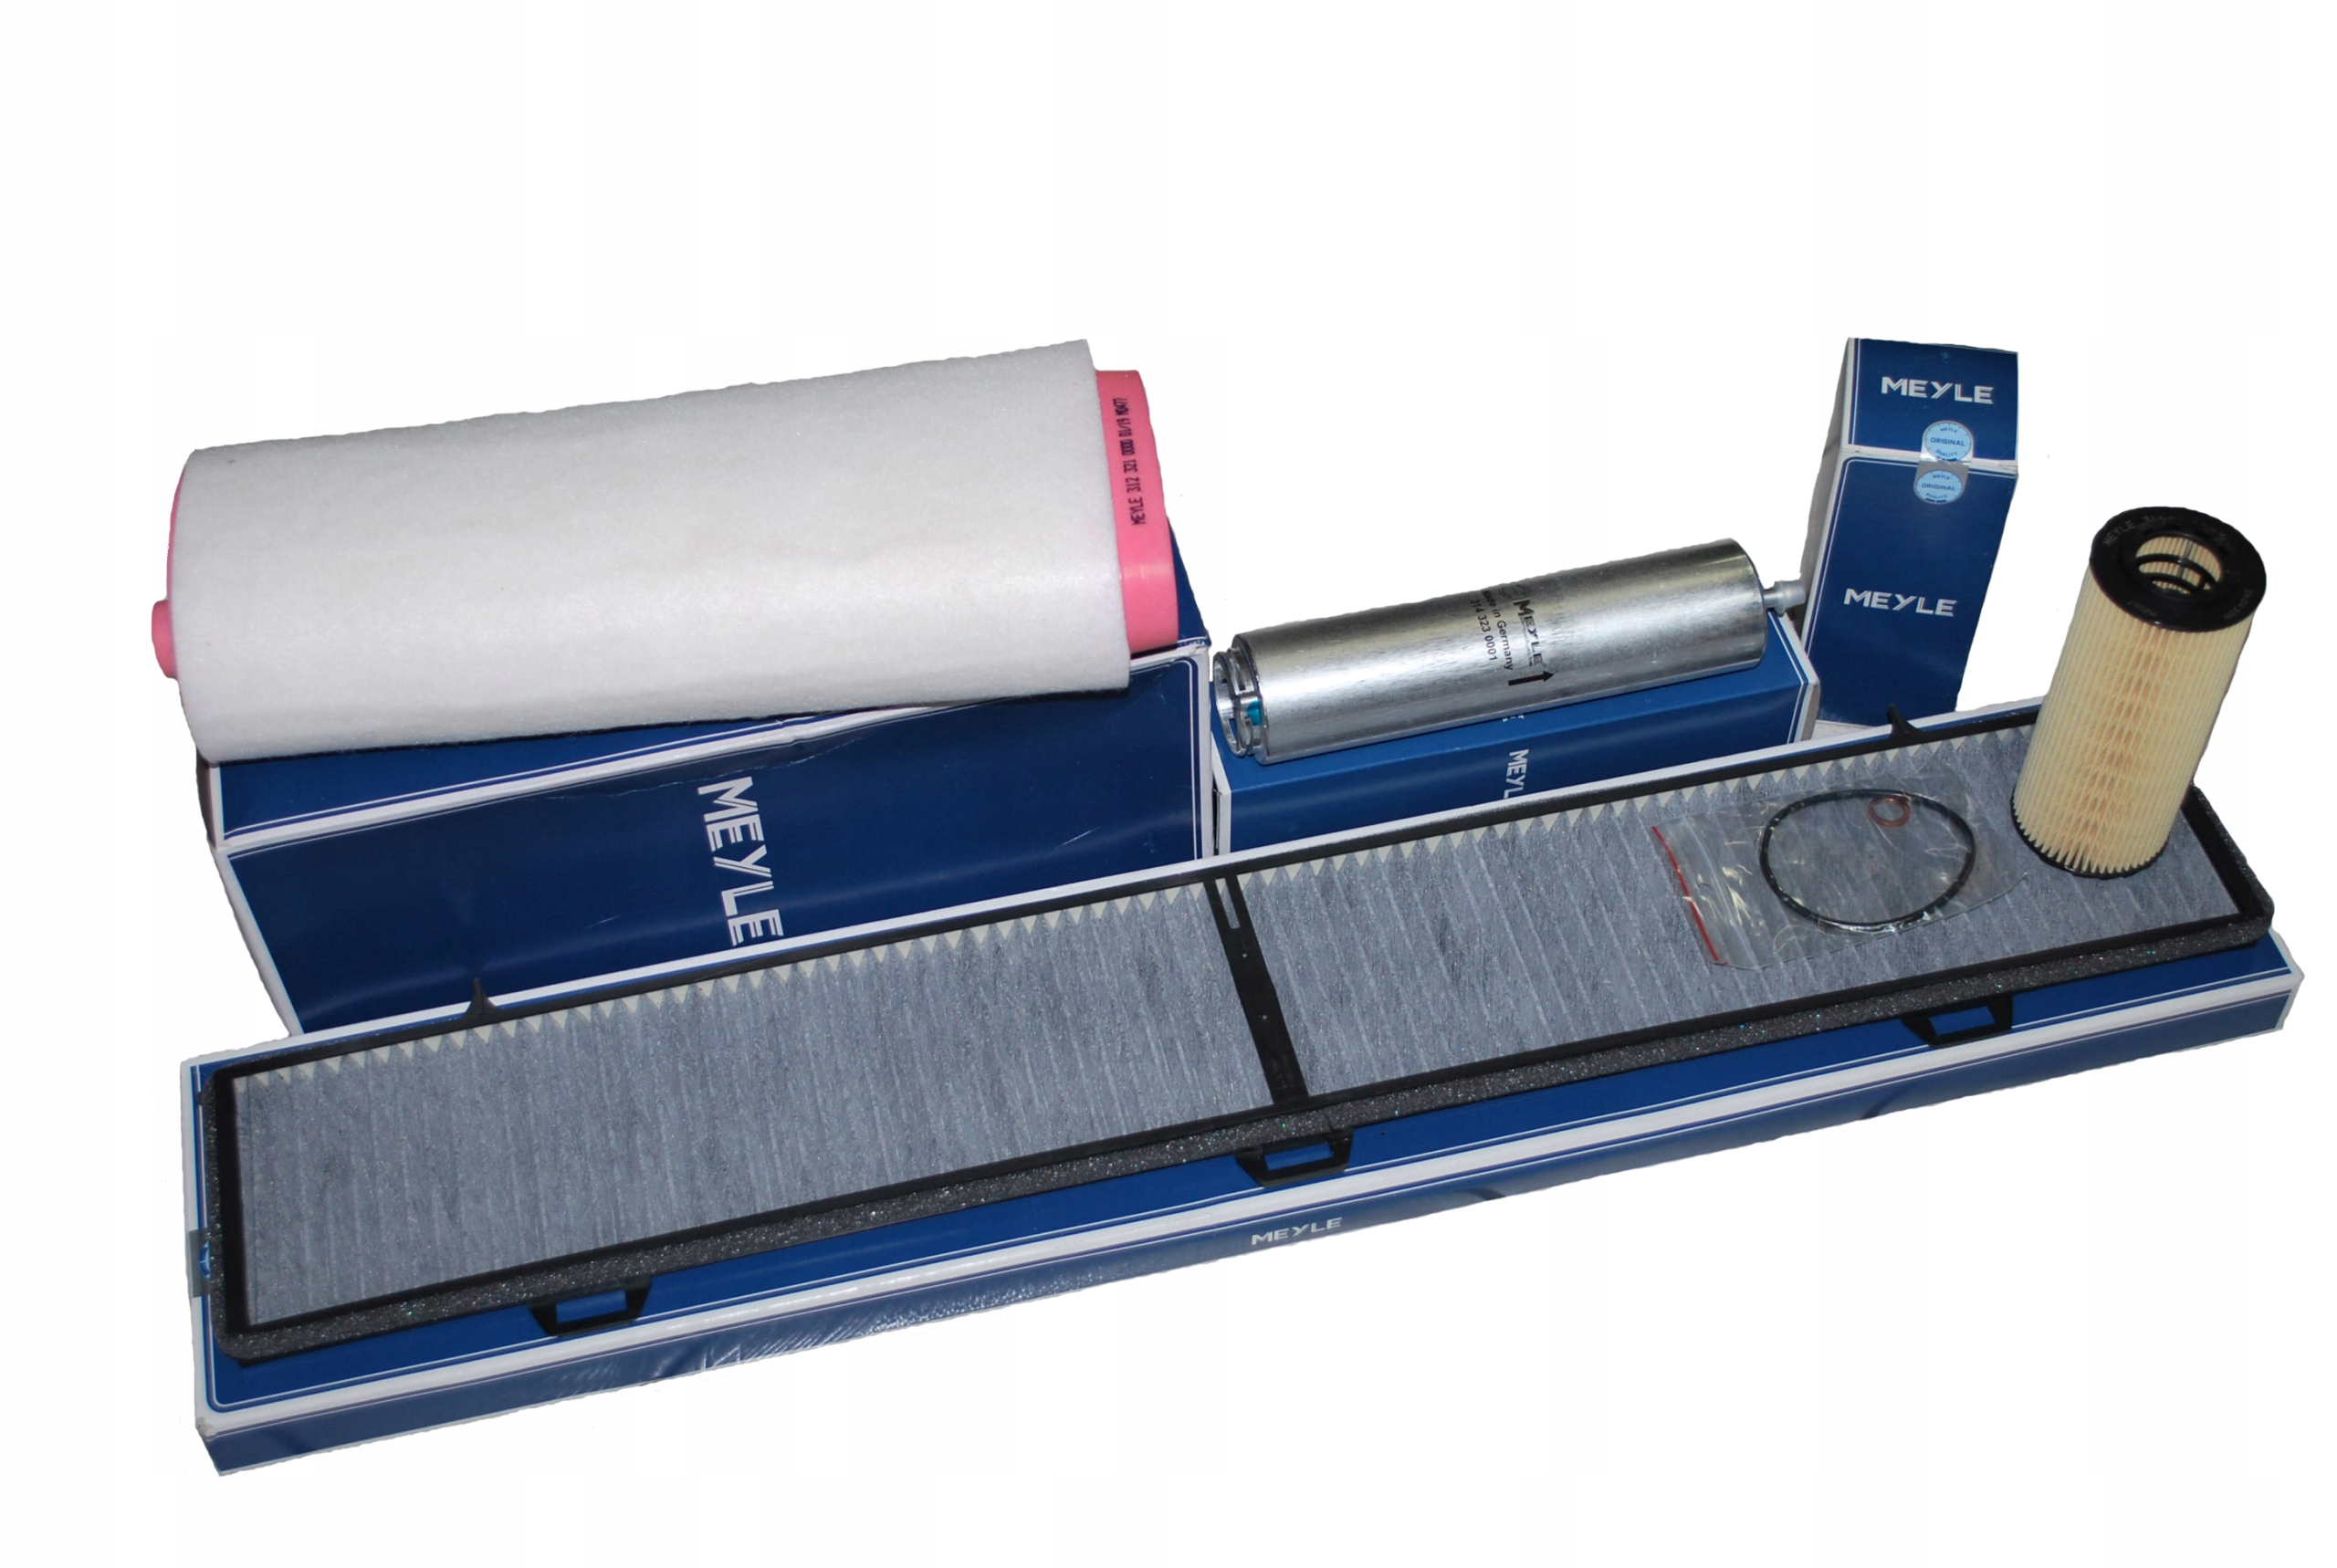 фильтры комплект bmw 3 e90 318 320d 163km komple 4szt